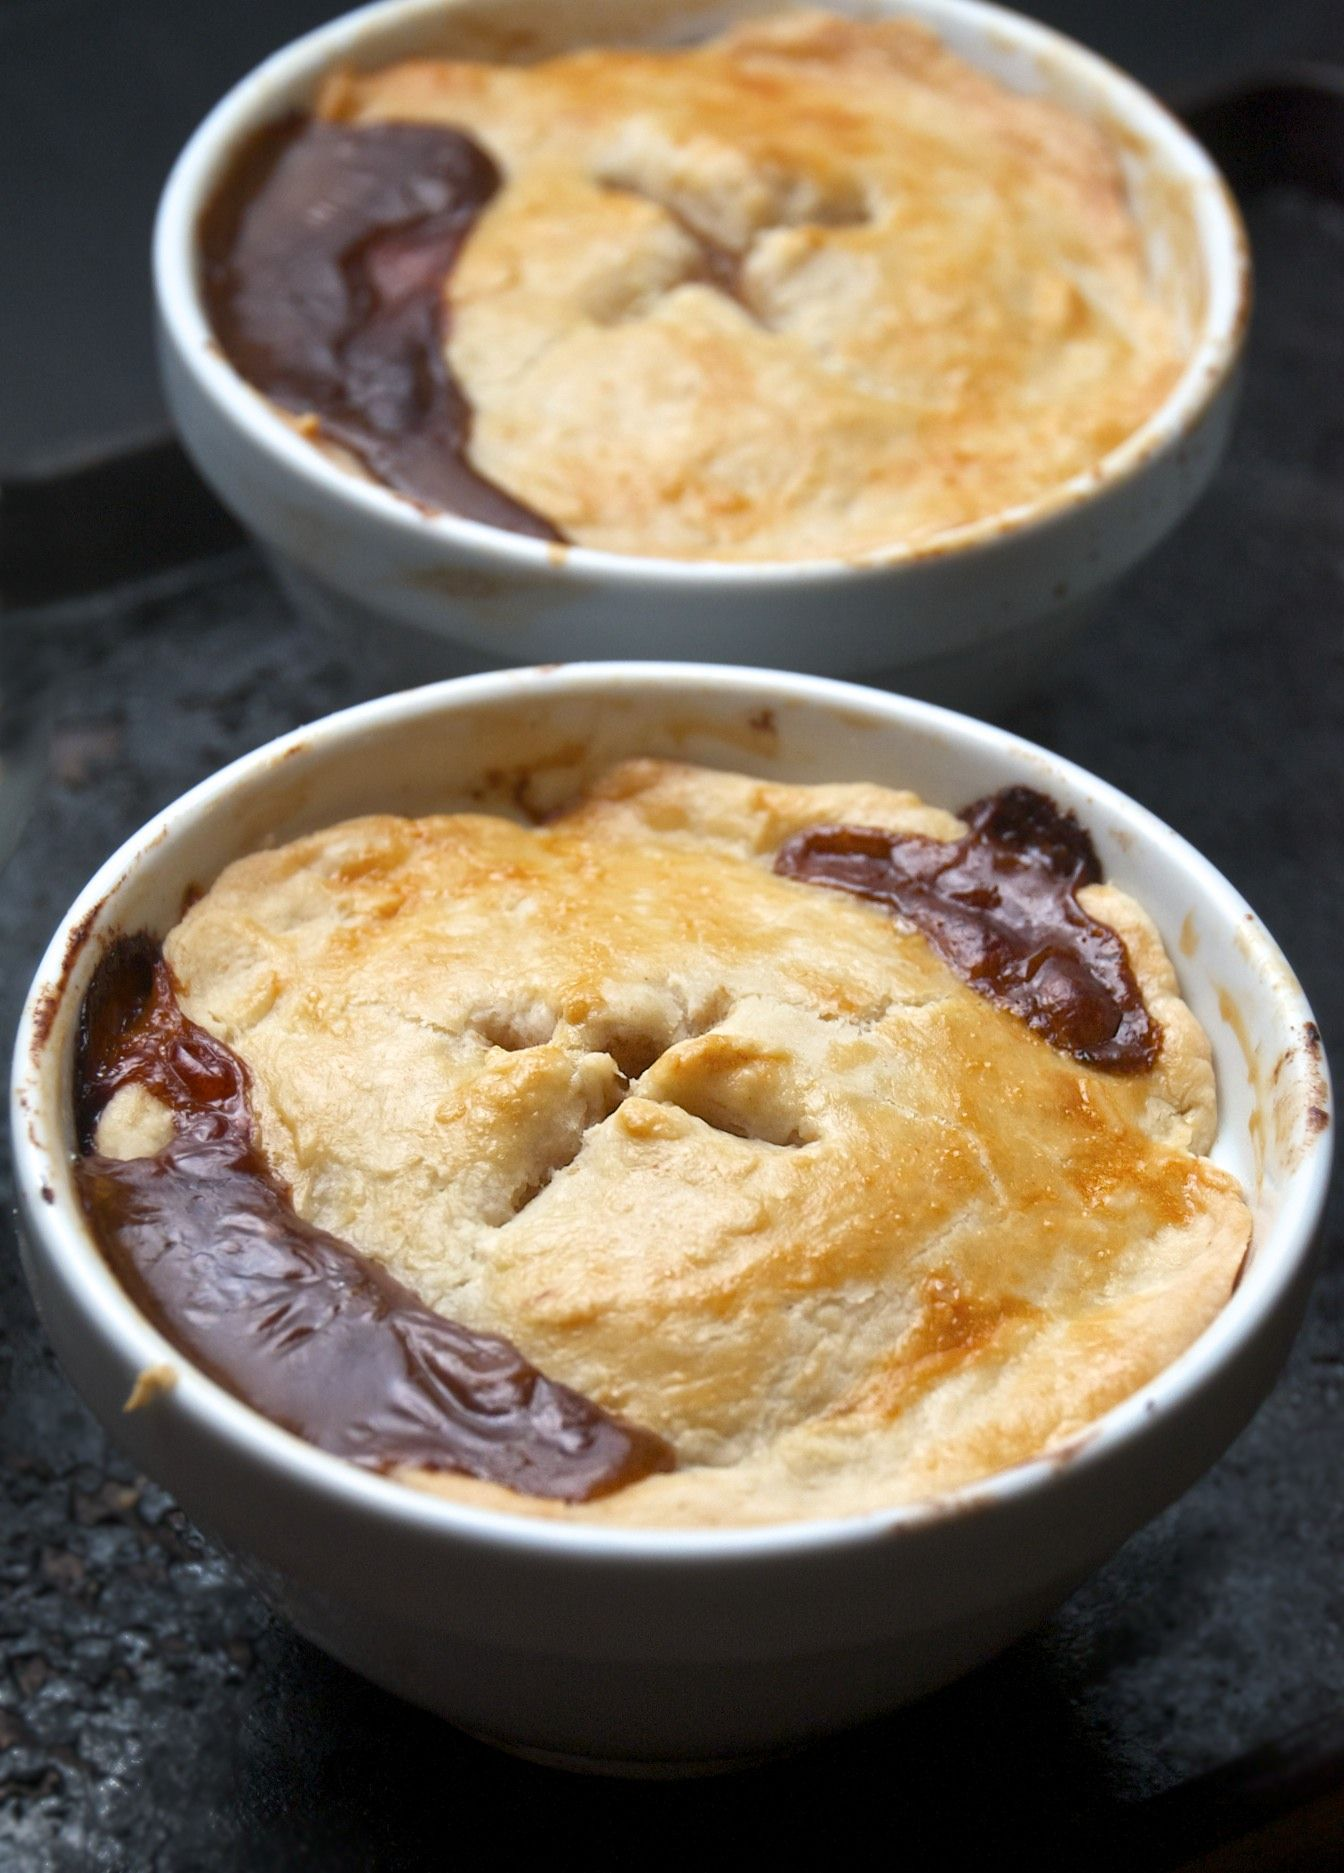 Steak and Guinness Pies | Steak and guinness pie, Dessert ...